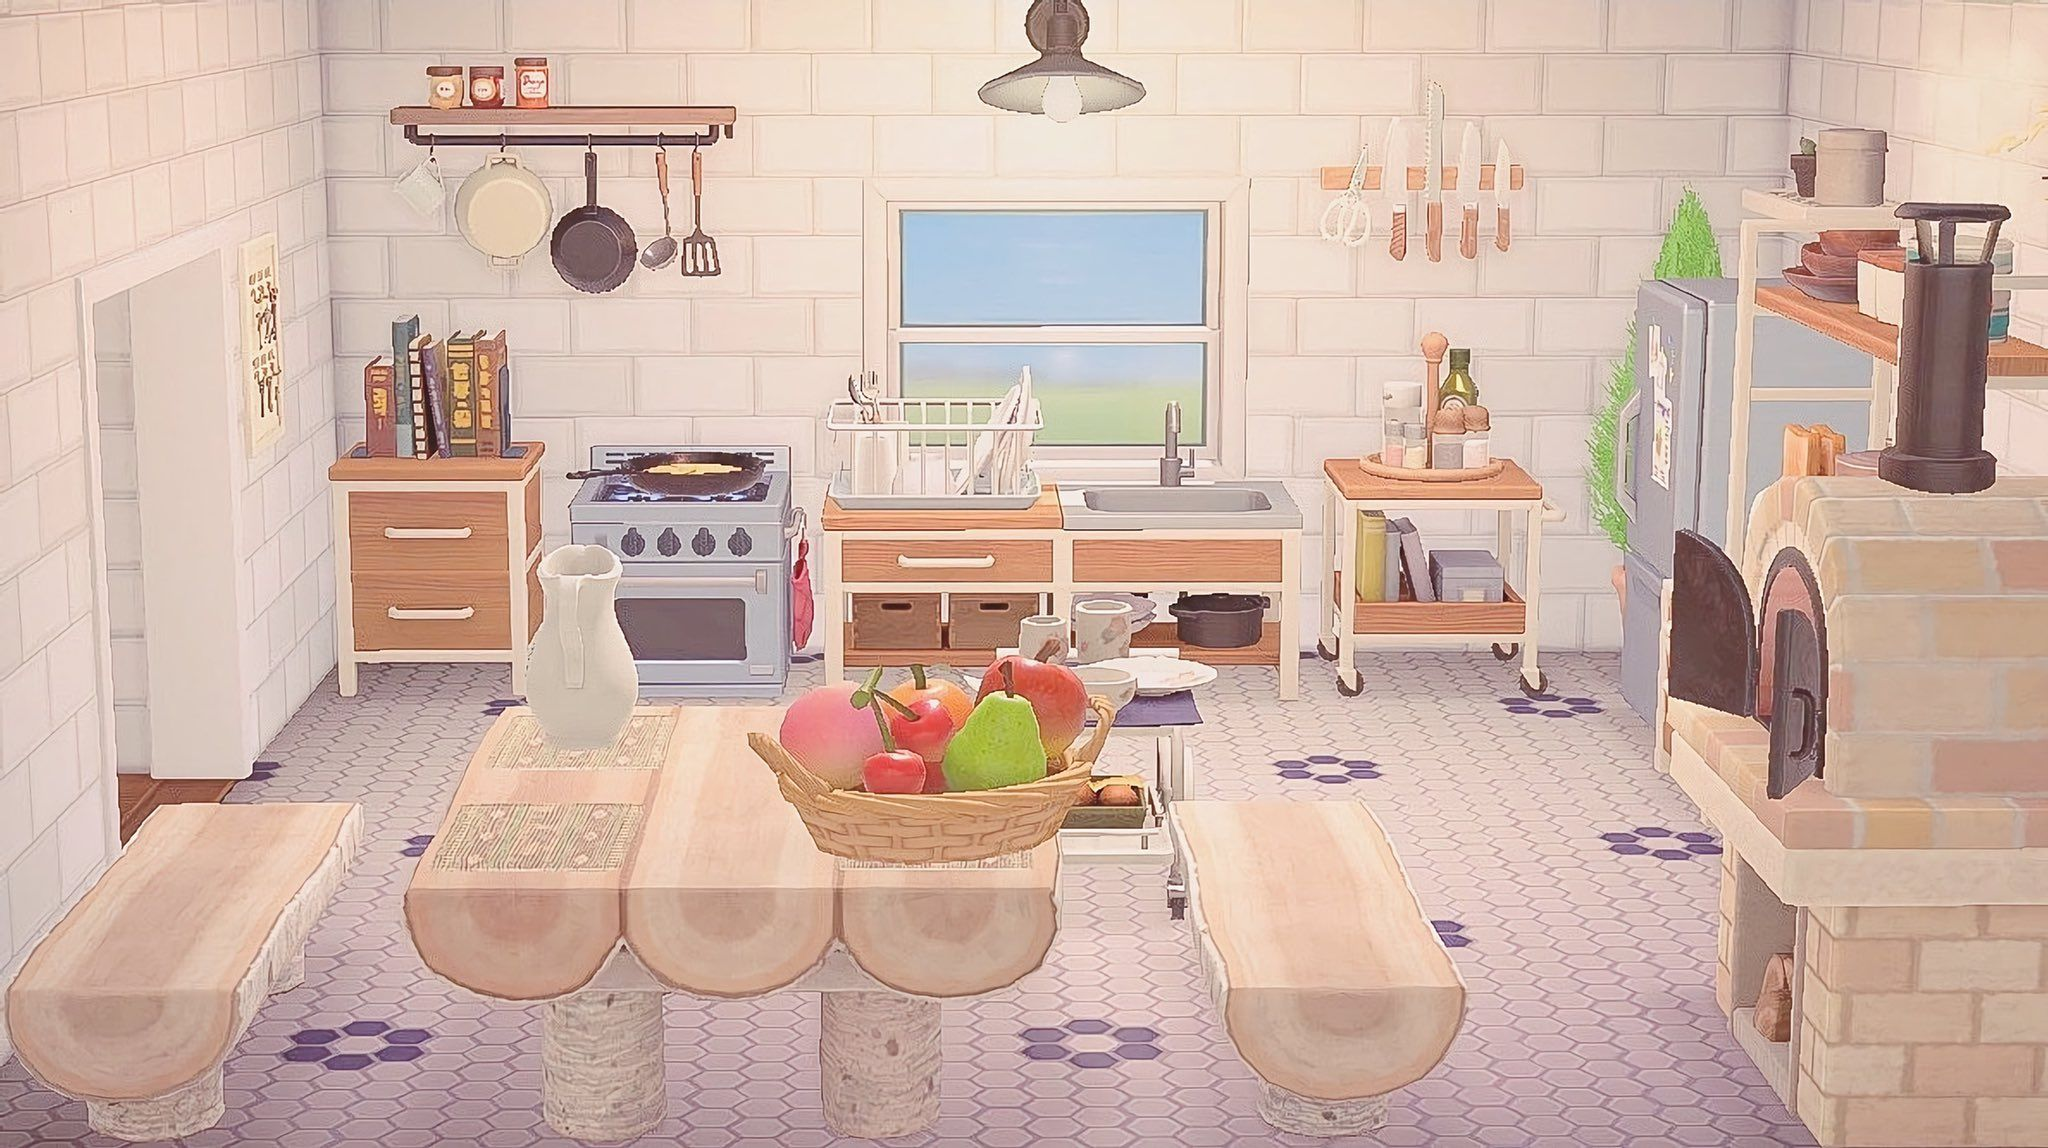 Kitchen Island Counter Animal Crossing New Horizons ... on Animal Crossing Kitchen Counter  id=17970